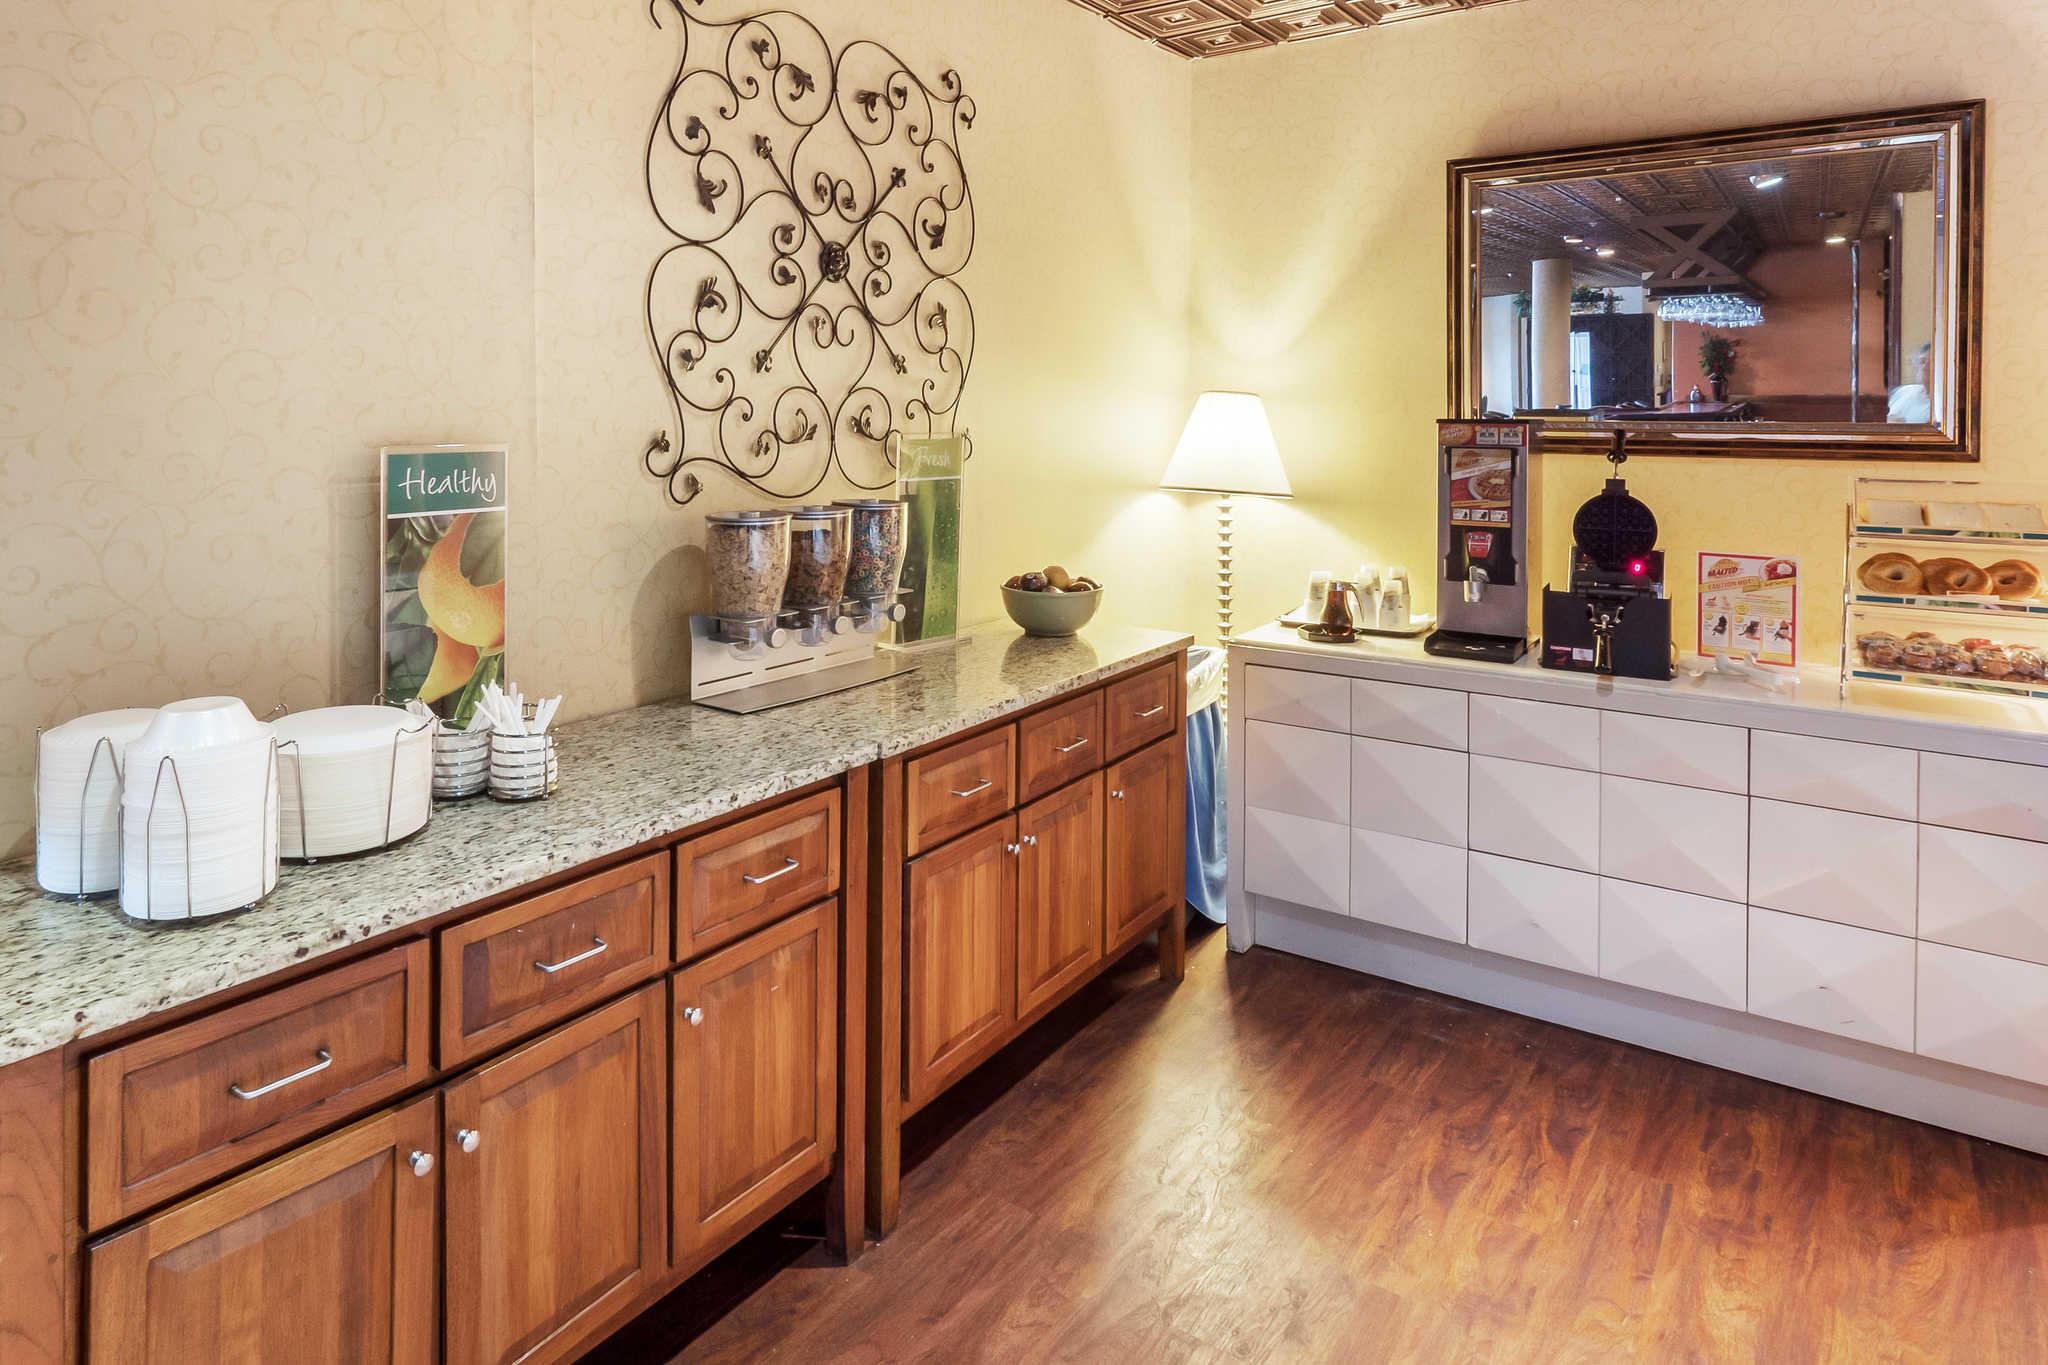 Quality Inn & Suites image 26